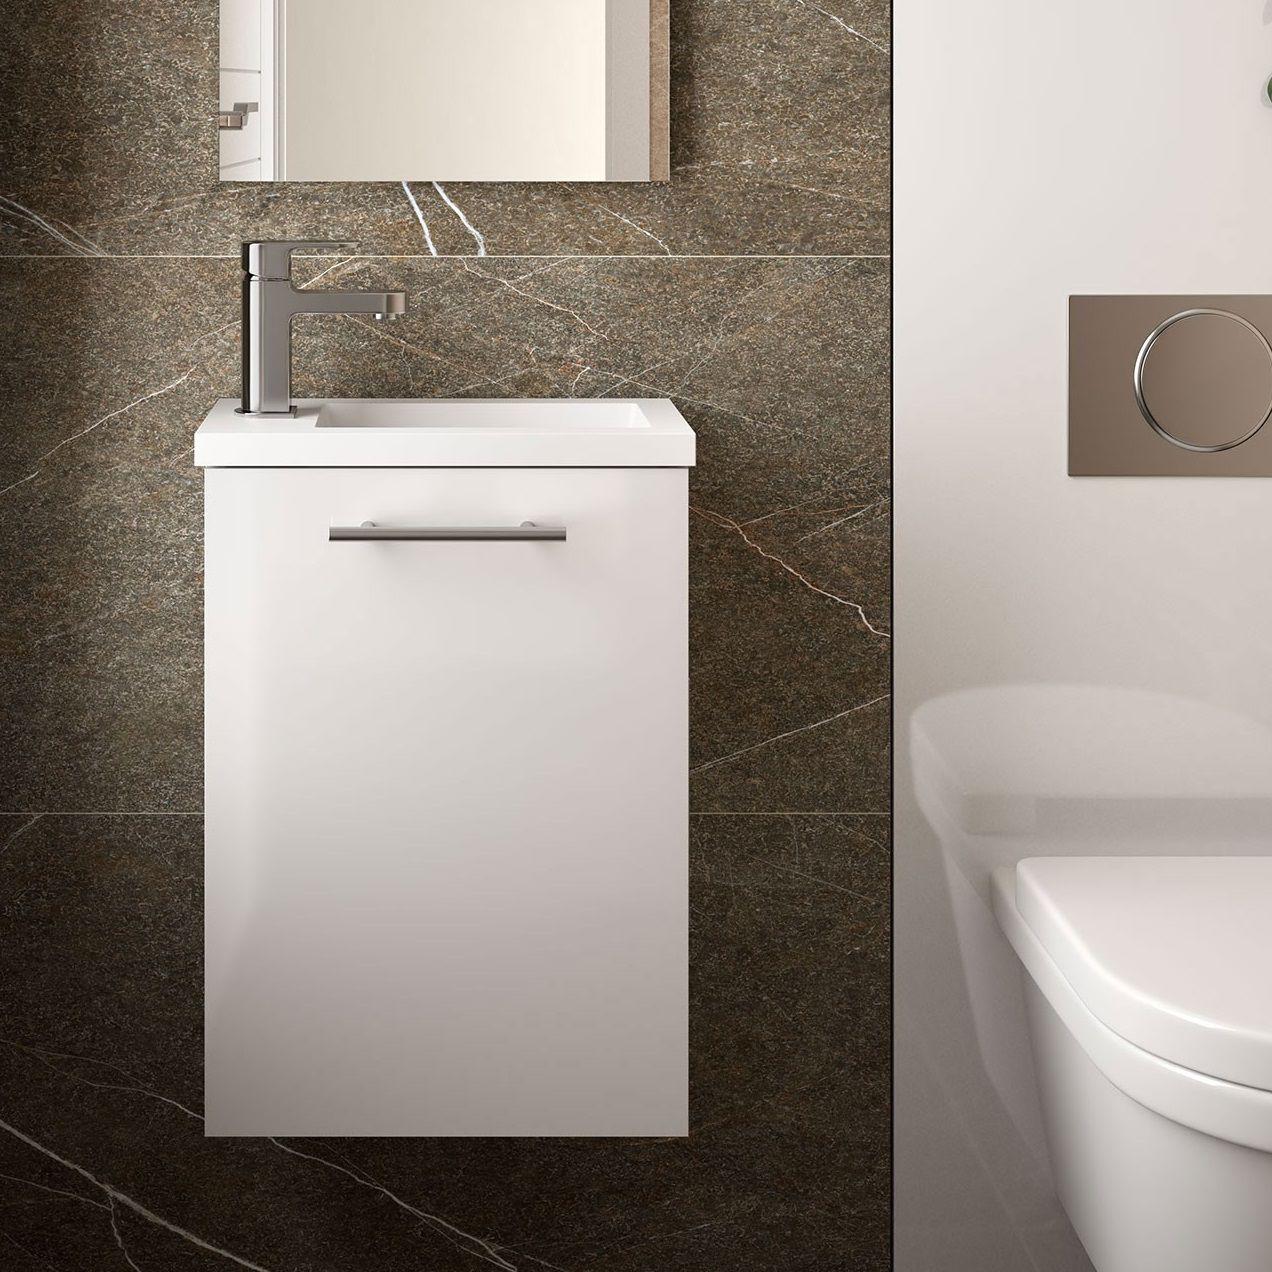 ensemble meuble vasque micro 40cm 1 porte blanc brillant salgar ref 22520